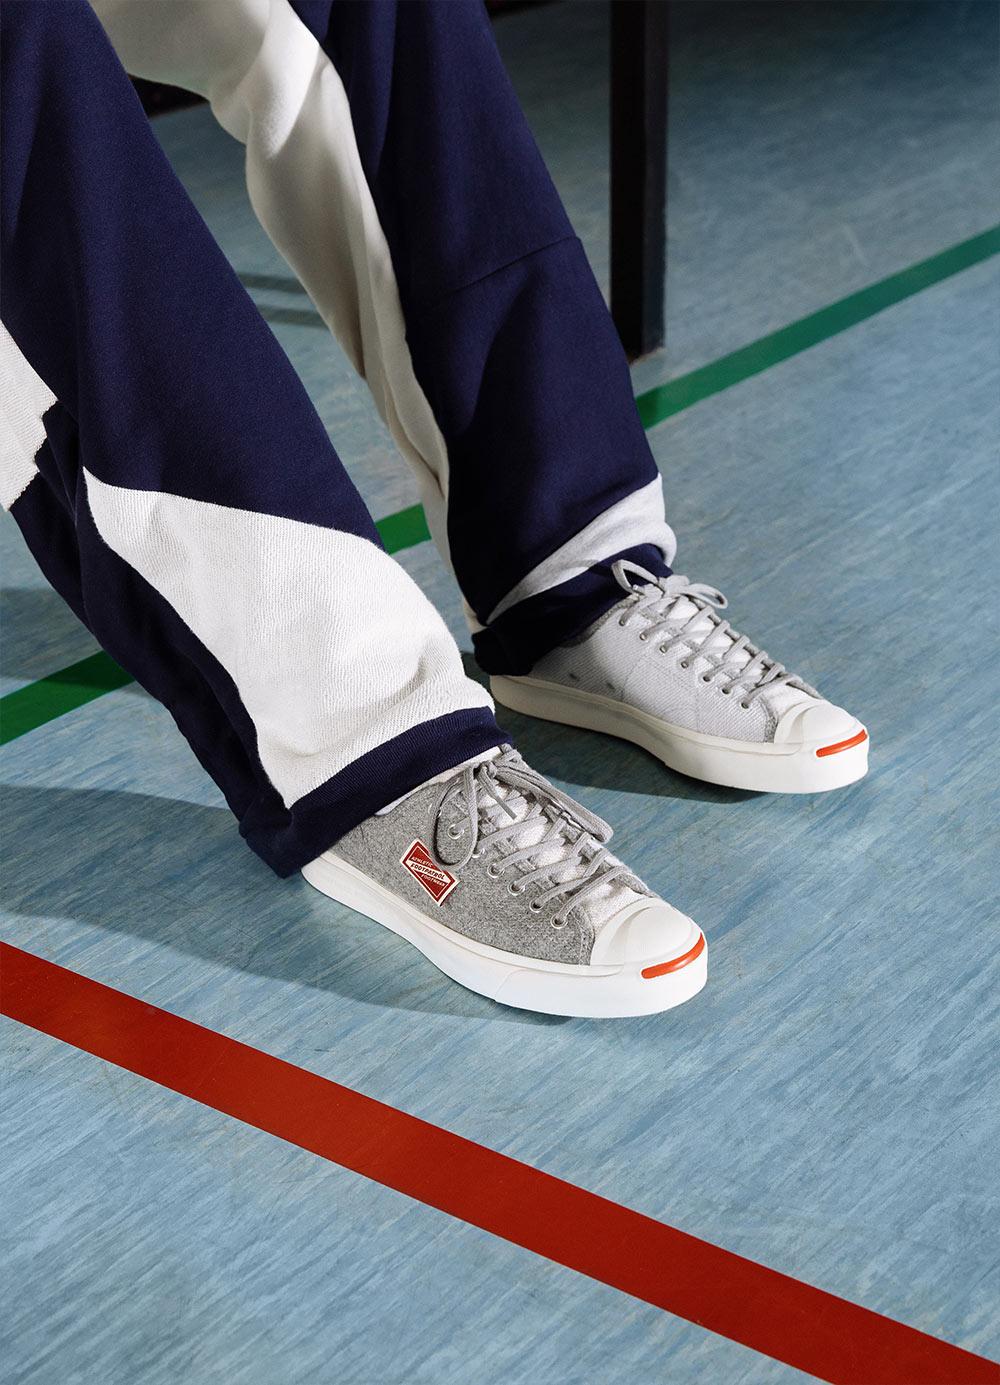 CONVERSE-X-FOOTPATROL-Blog-3.jpg